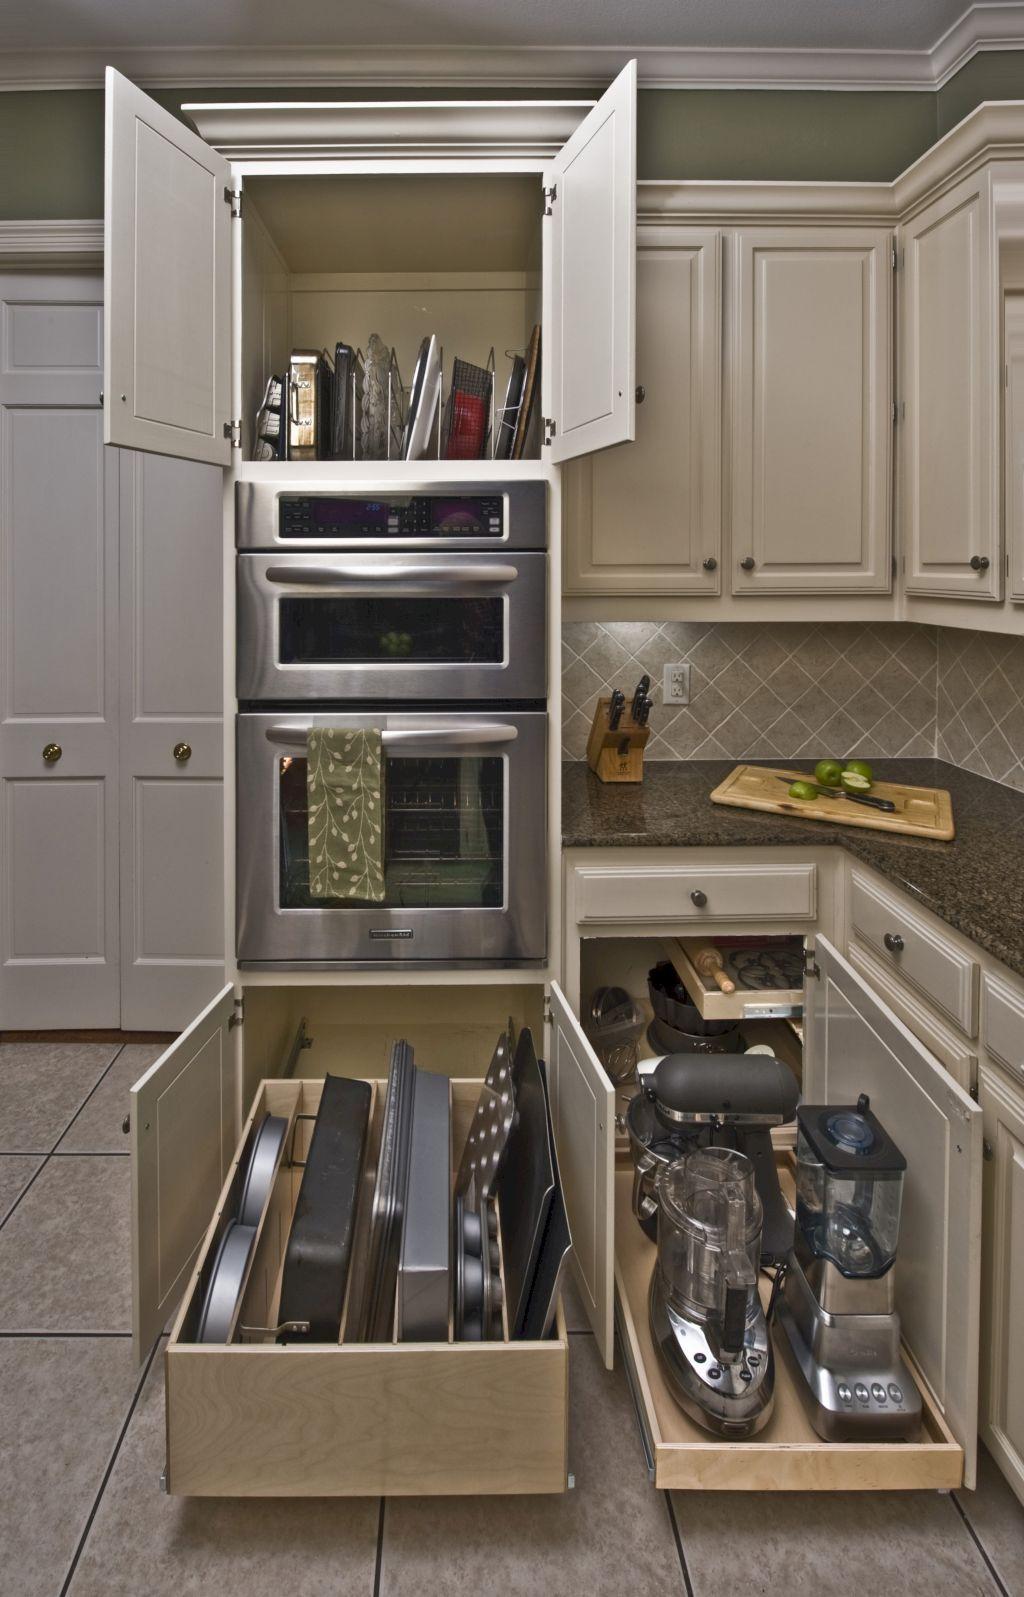 50 Clever Things Organized Kitchen Storage | Cocinas, Organizadores ...